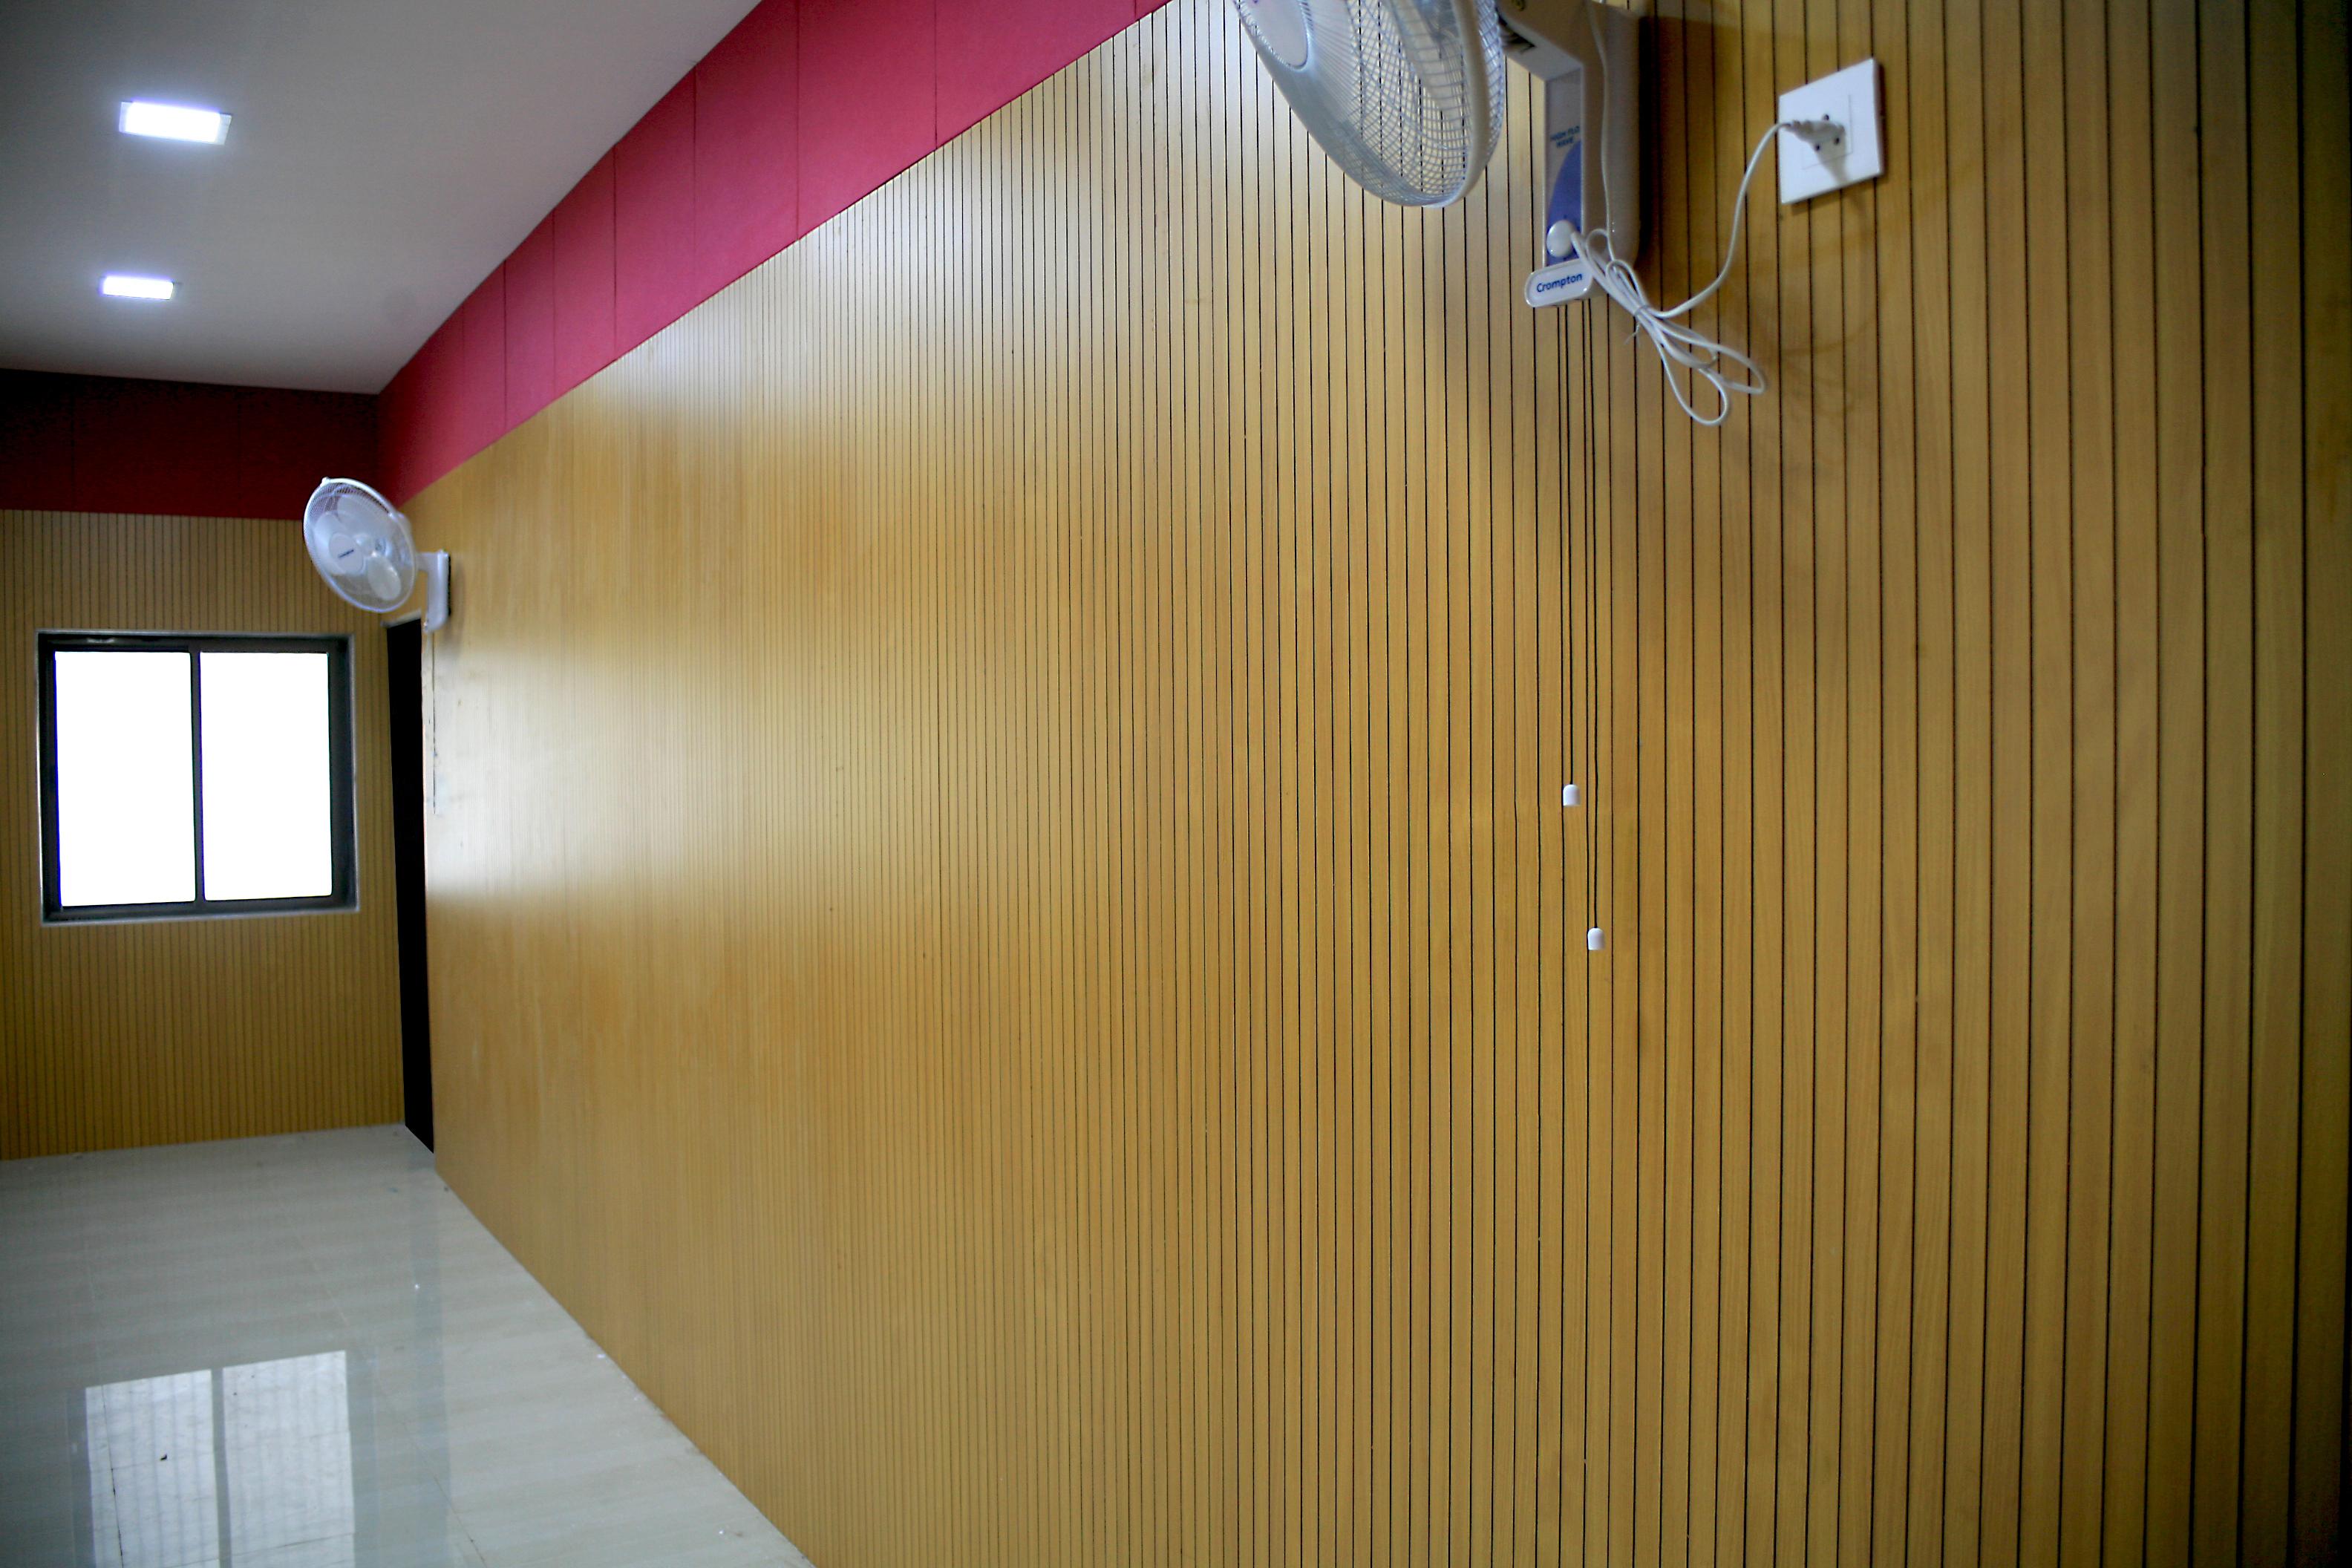 GROOWOOD Acoustical Panels